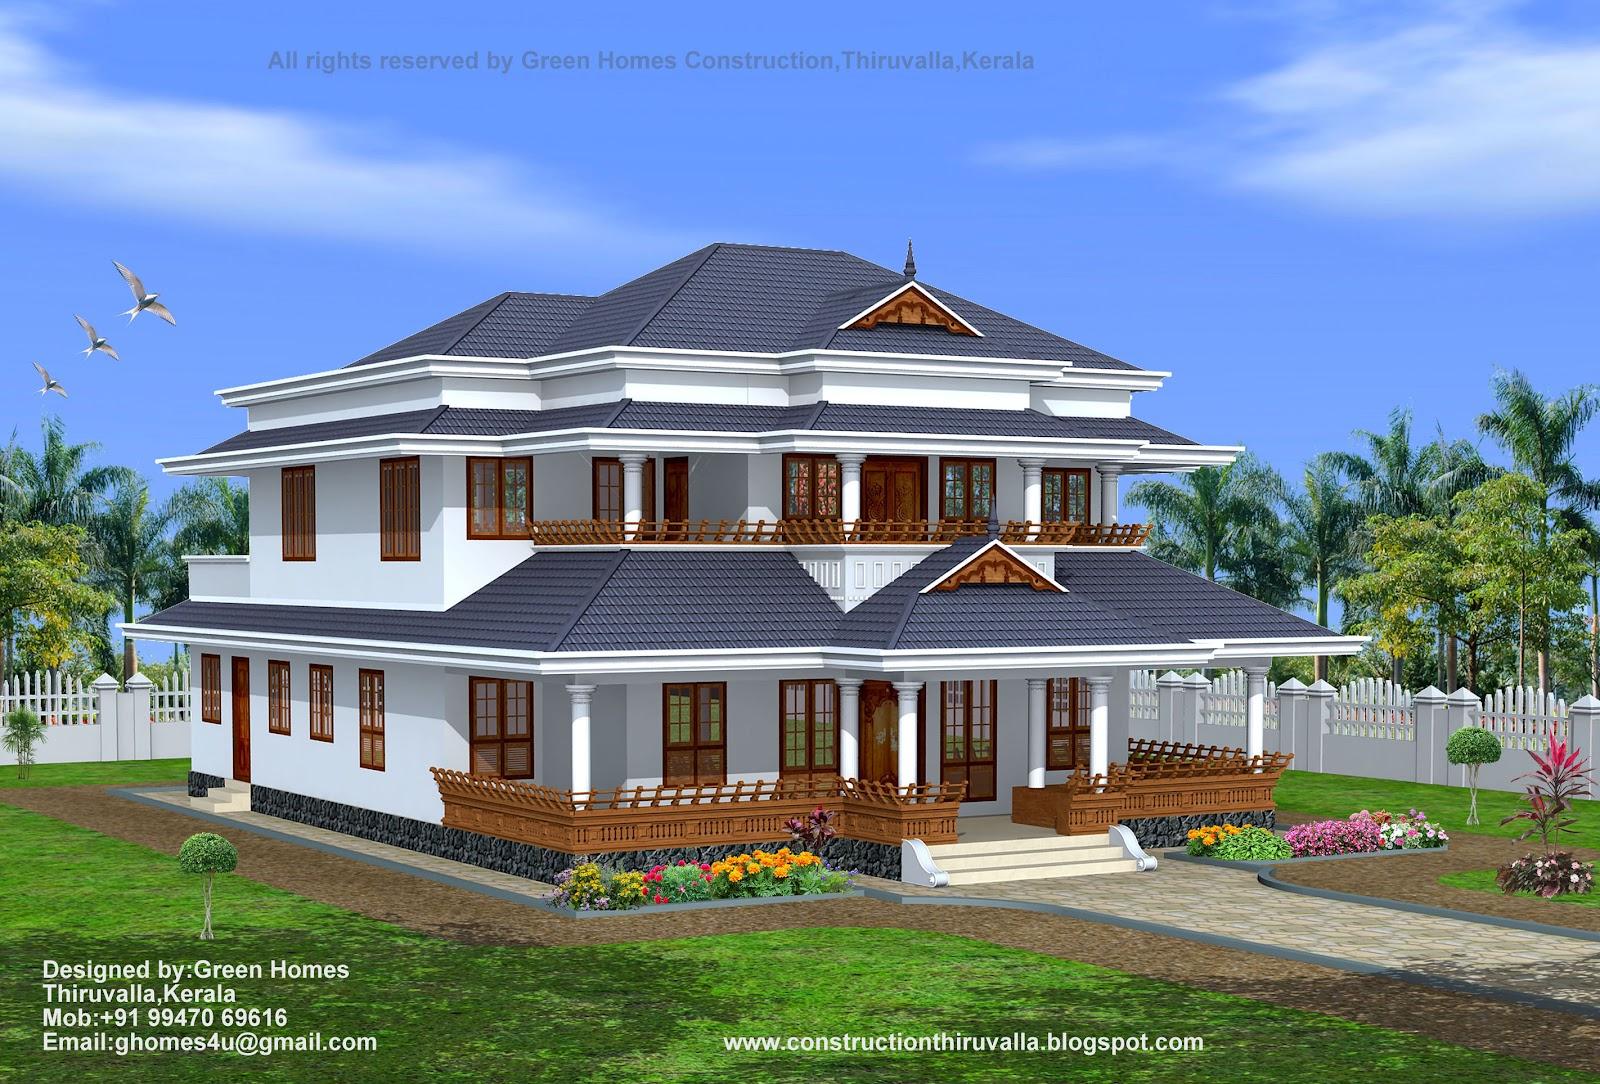 Green Homes: Traditional Style Kerala Home Design-3450 Sq.Feet